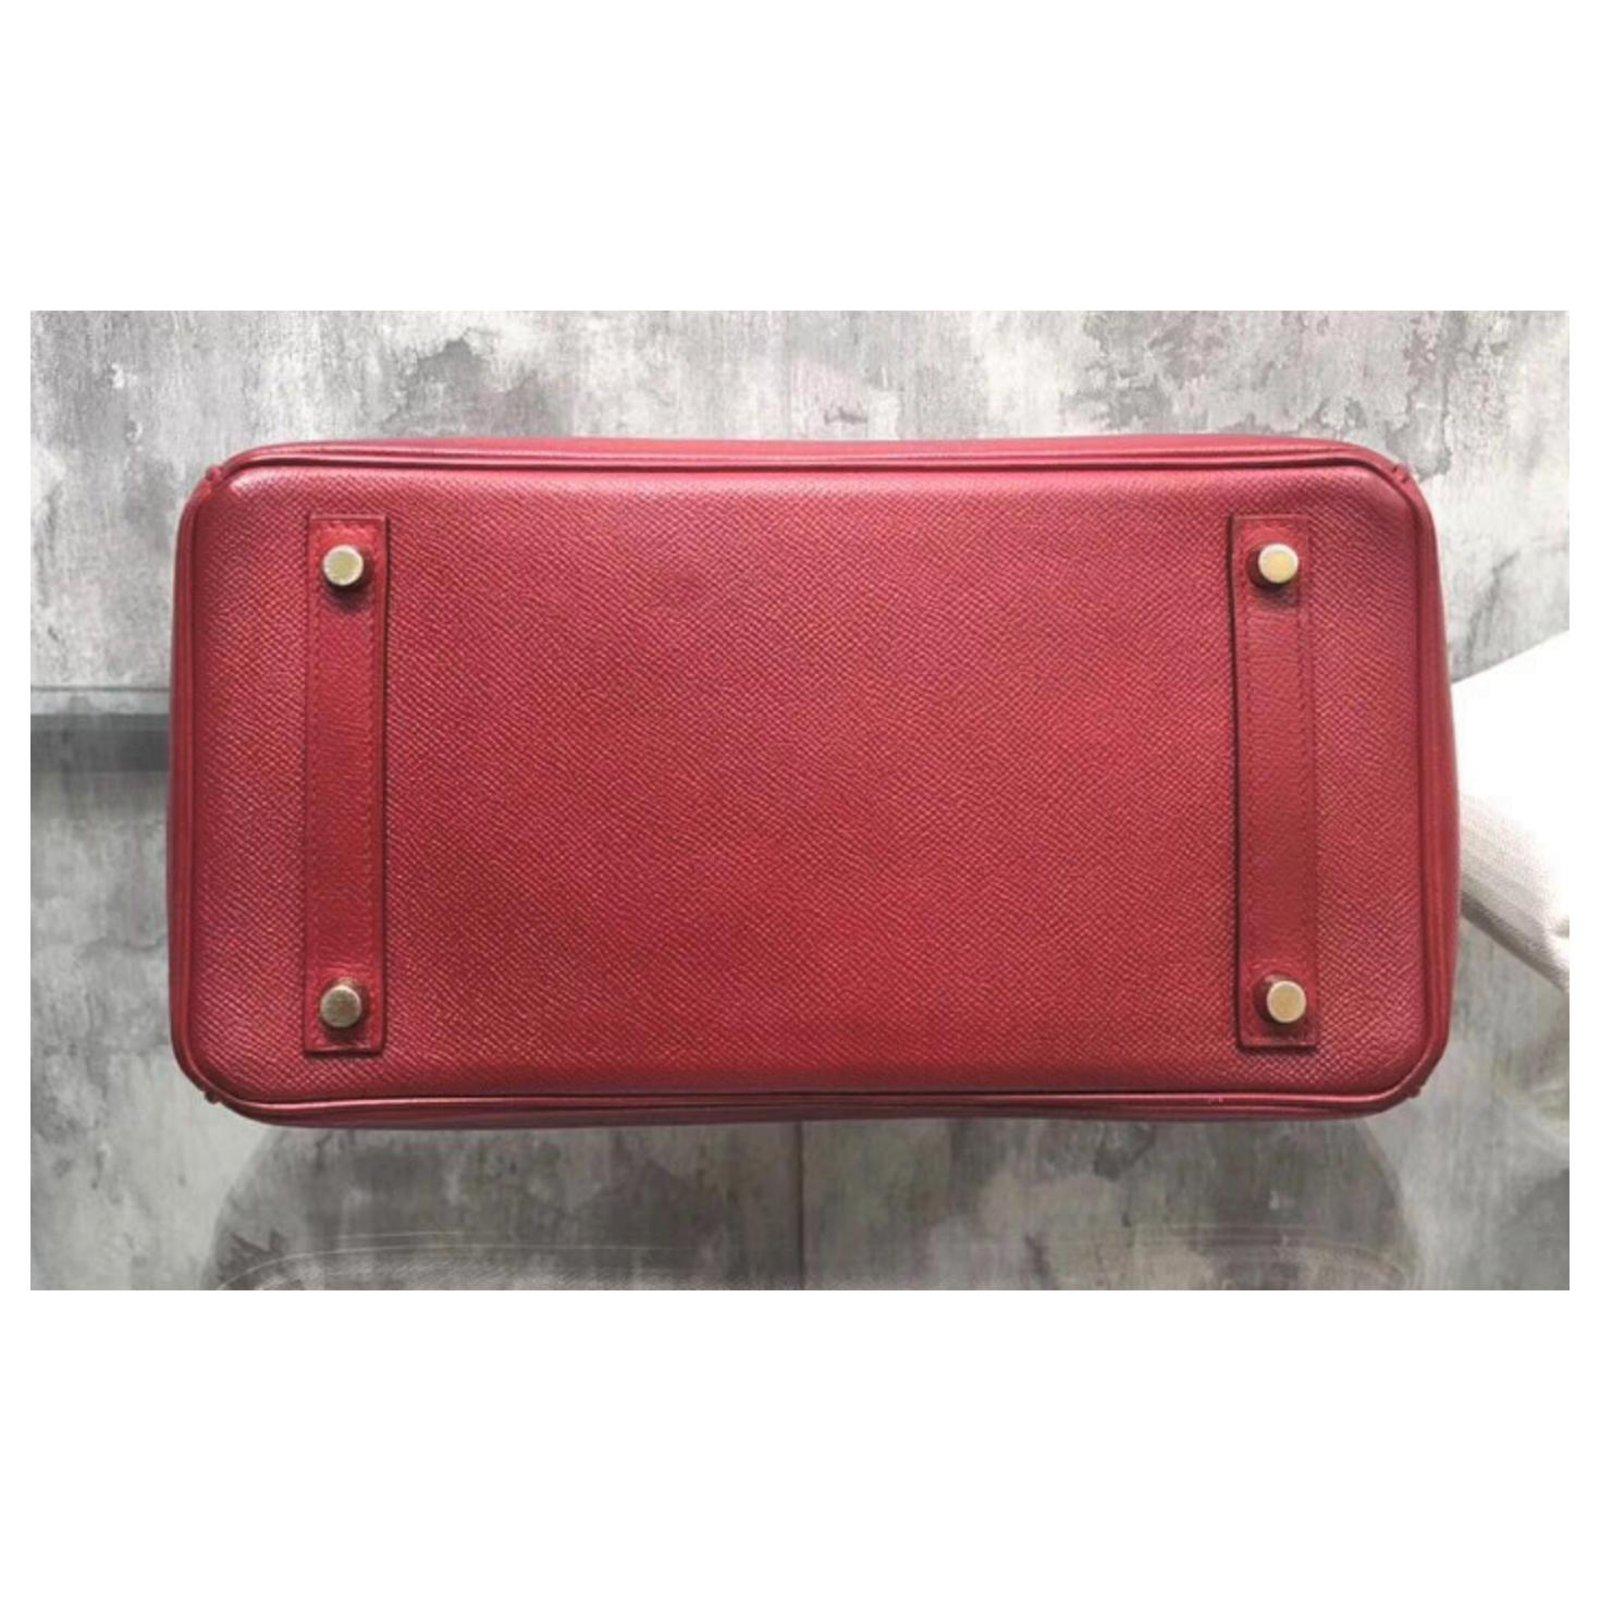 50ea7bedf1b7 Hermès HERMES BIRKIN 30 in Rouge H Epsom with GHW Handbags Leather Red  ref.111215 - Joli Closet